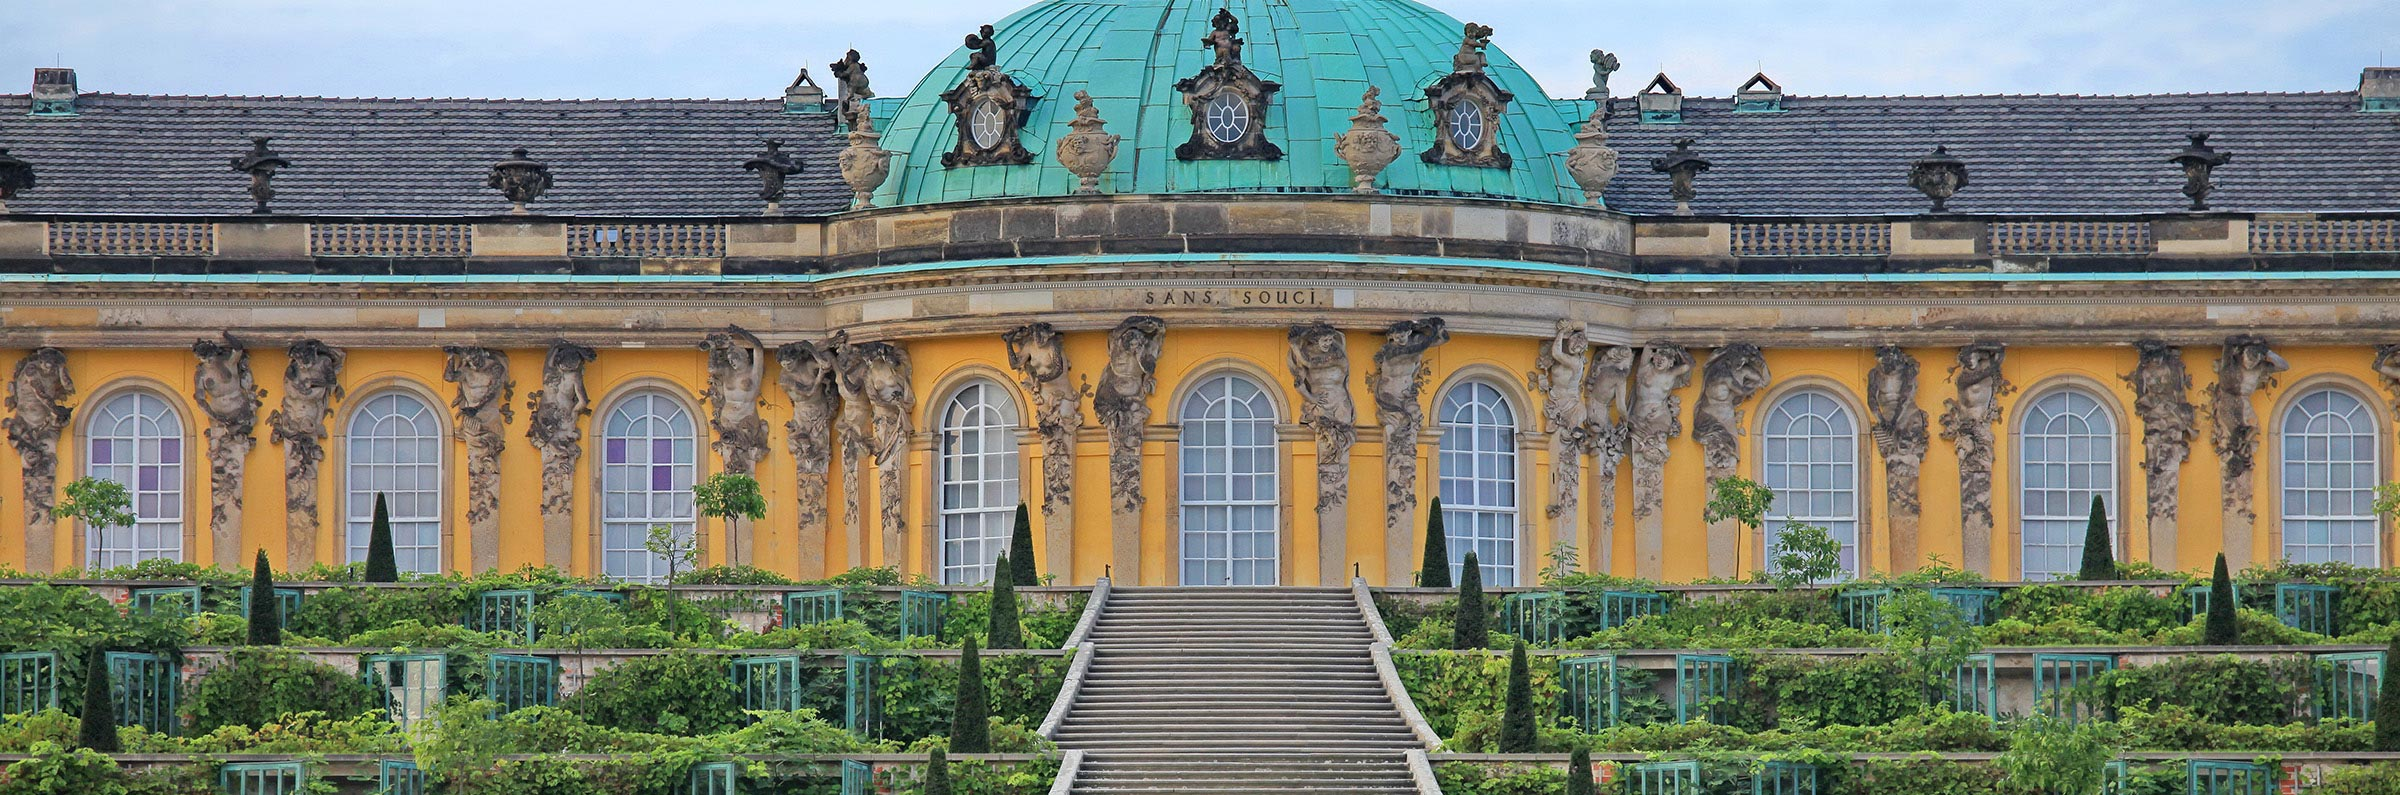 Viaje de un da in Berln